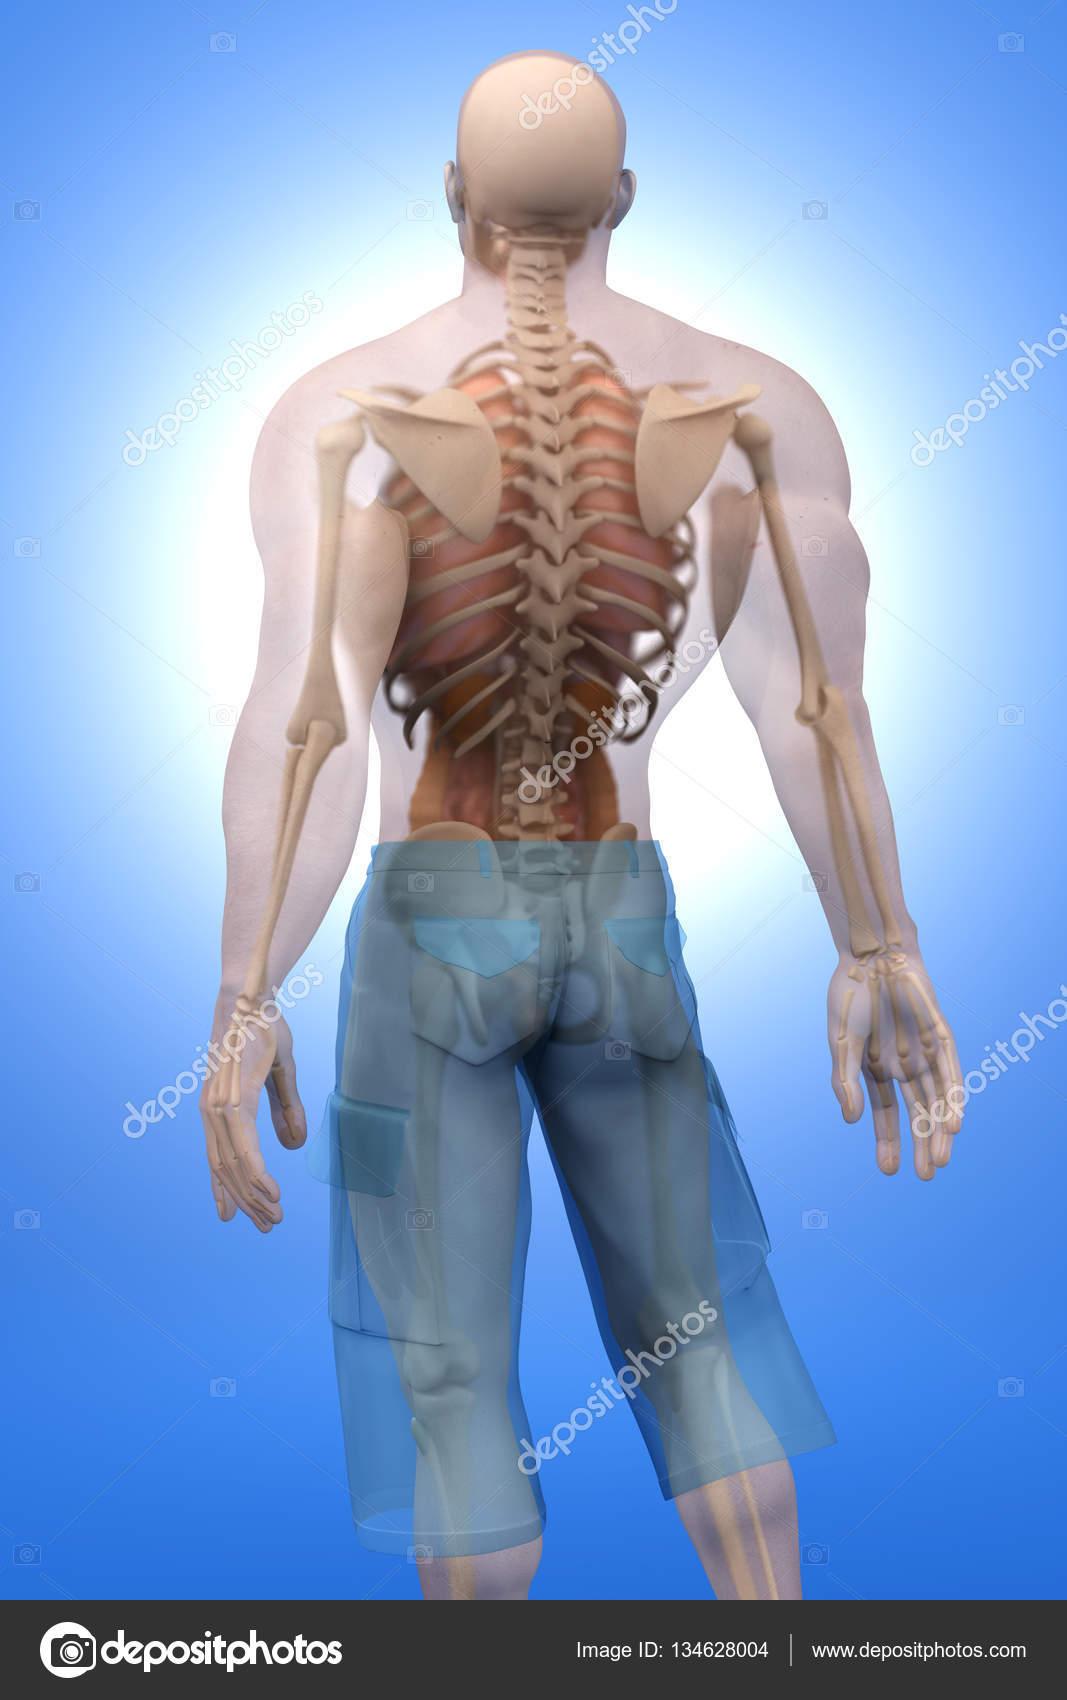 Visualización de anatomía humana - órganos internos — Foto de stock ...